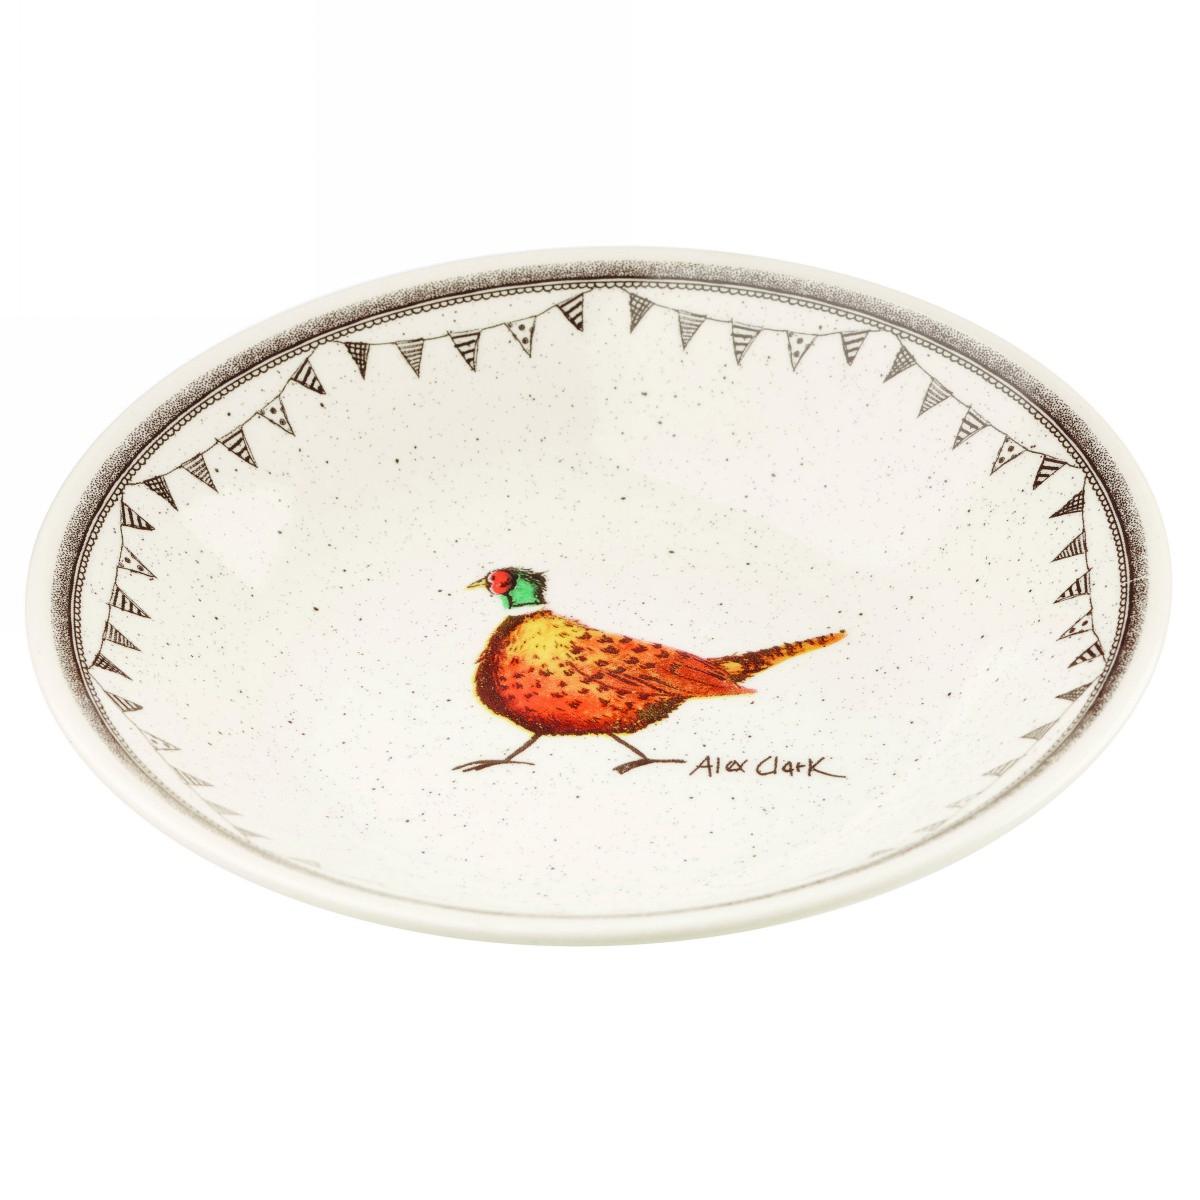 Тарелка суповая Churchill 20 см Живая природа Алекс Кларк